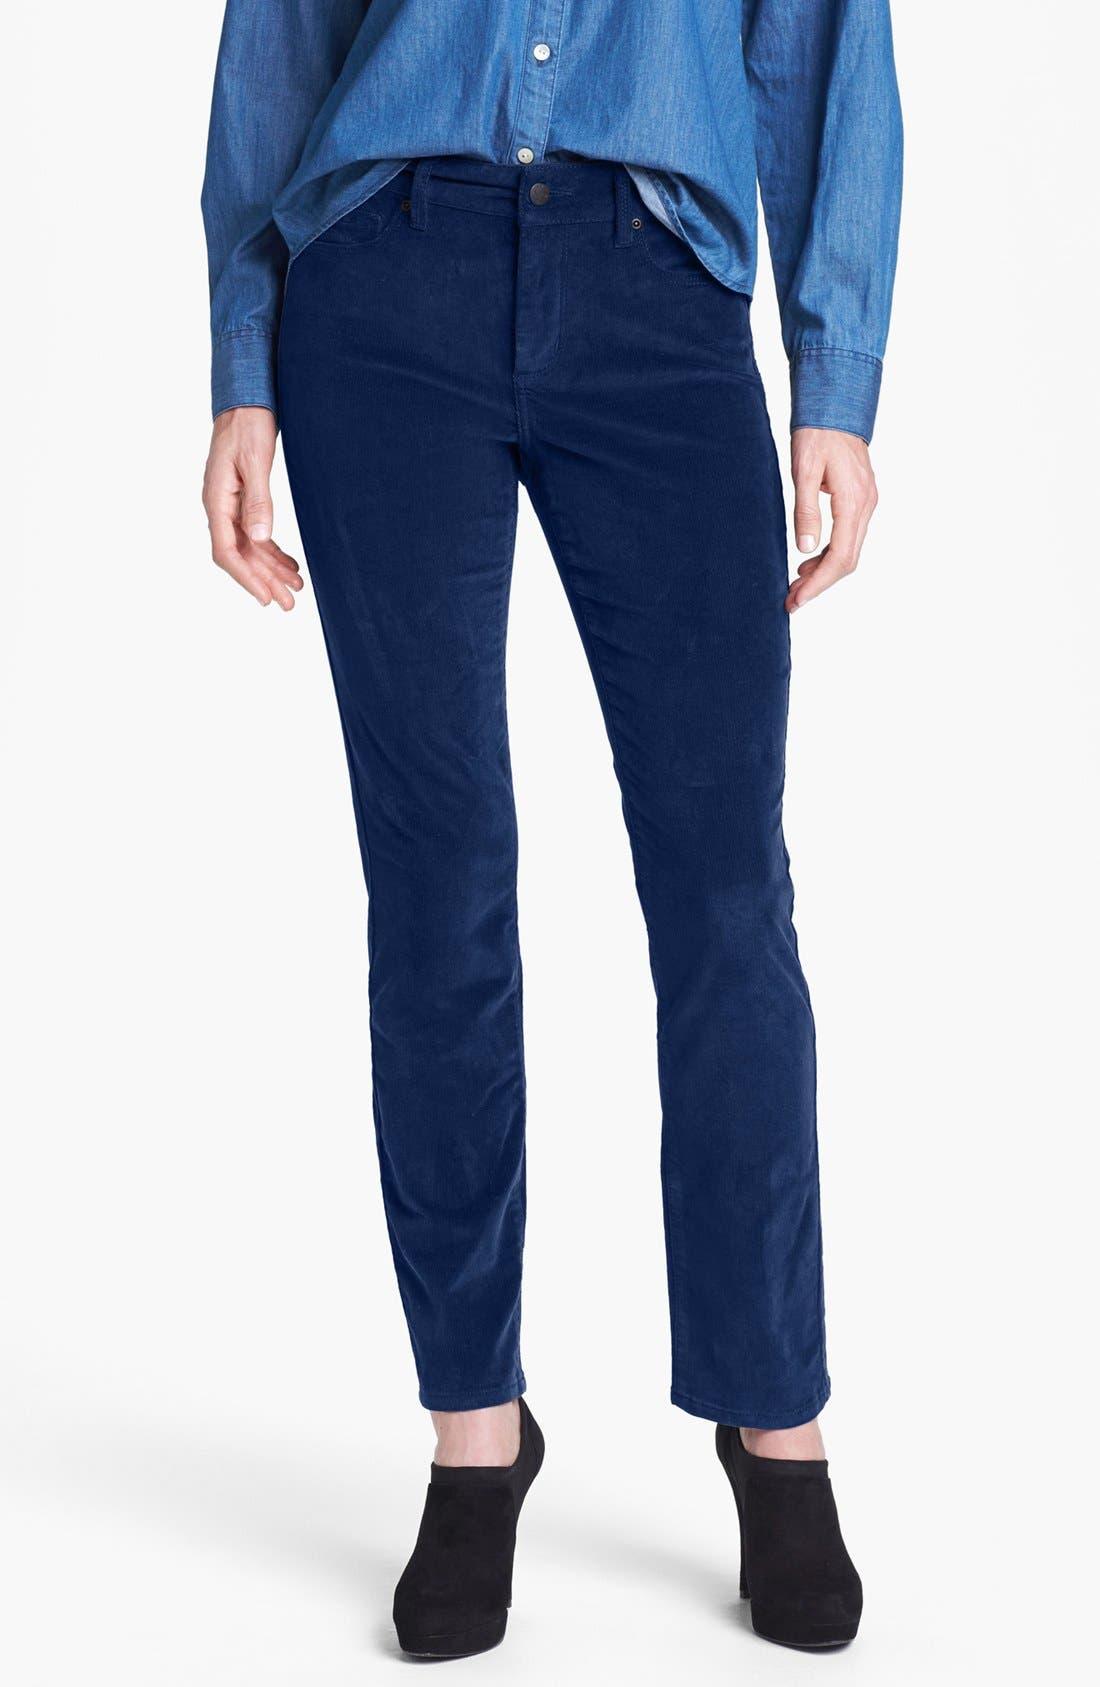 Alternate Image 1 Selected - NYDJ 'Sheri' Colored Stretch Corduroy Skinny Pants (Regular & Petite)